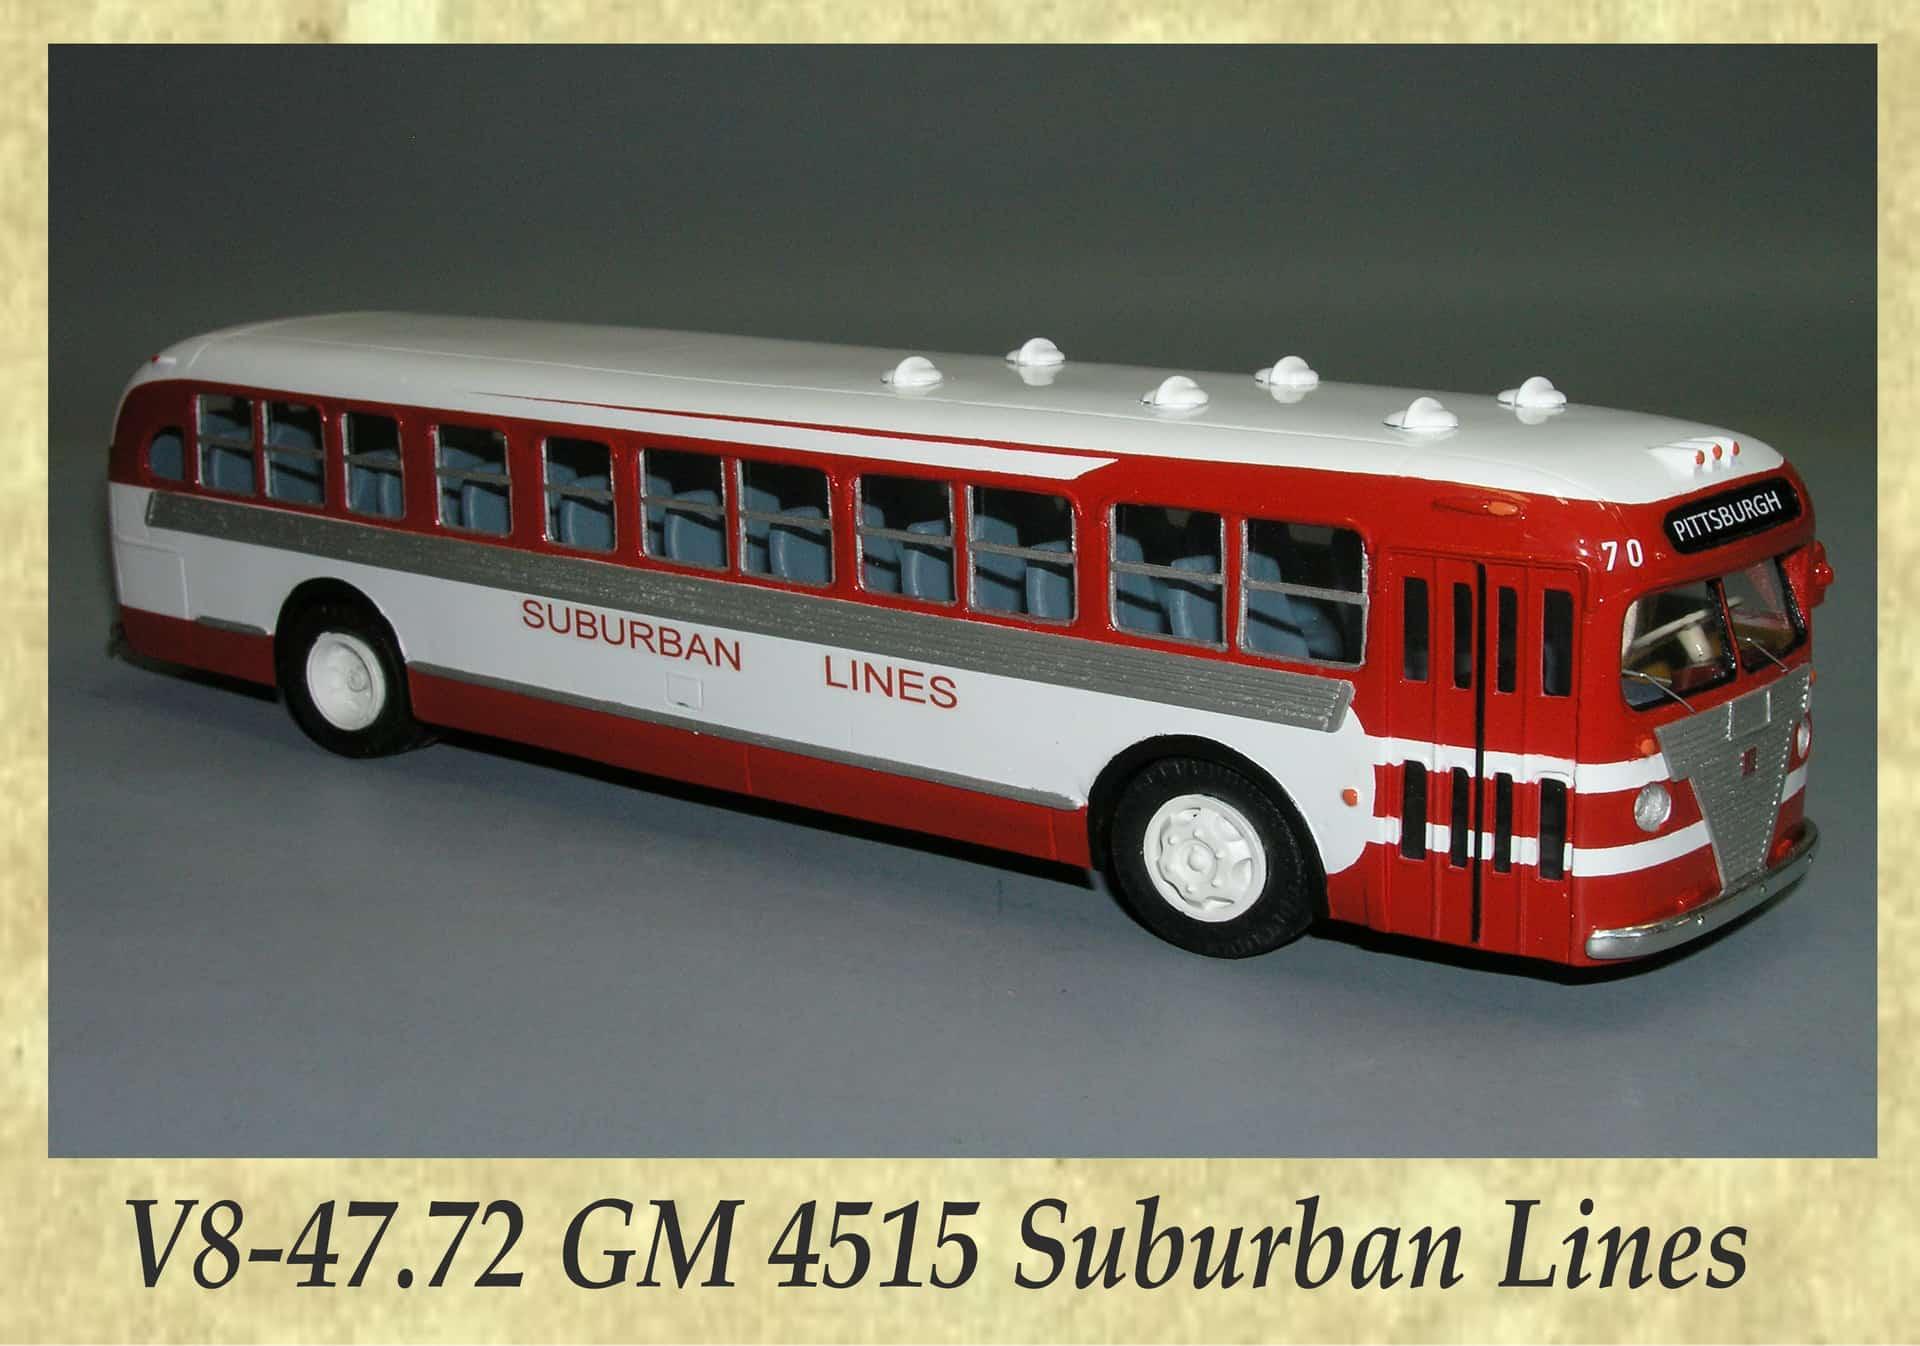 V8-47.72 GM 4515 Suburban Lines